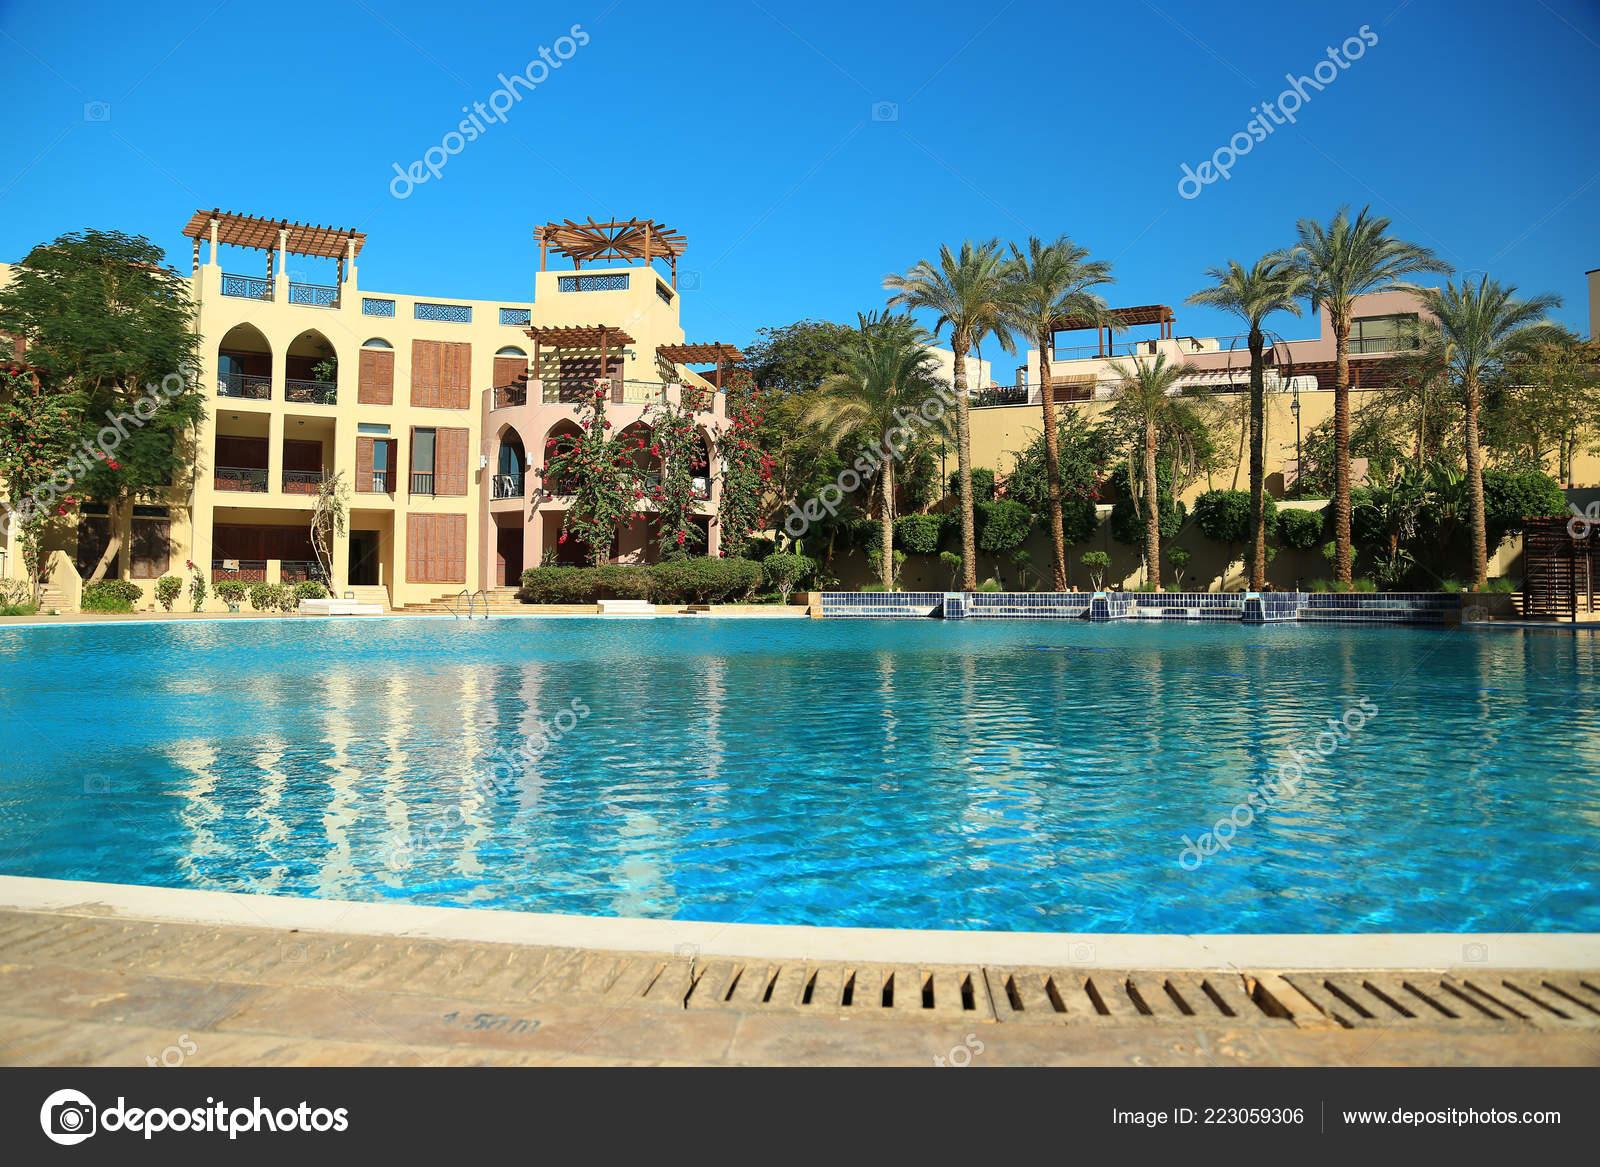 Jordan Aqaba December 2016 Outdoor Swimming Pool Clean Water ...